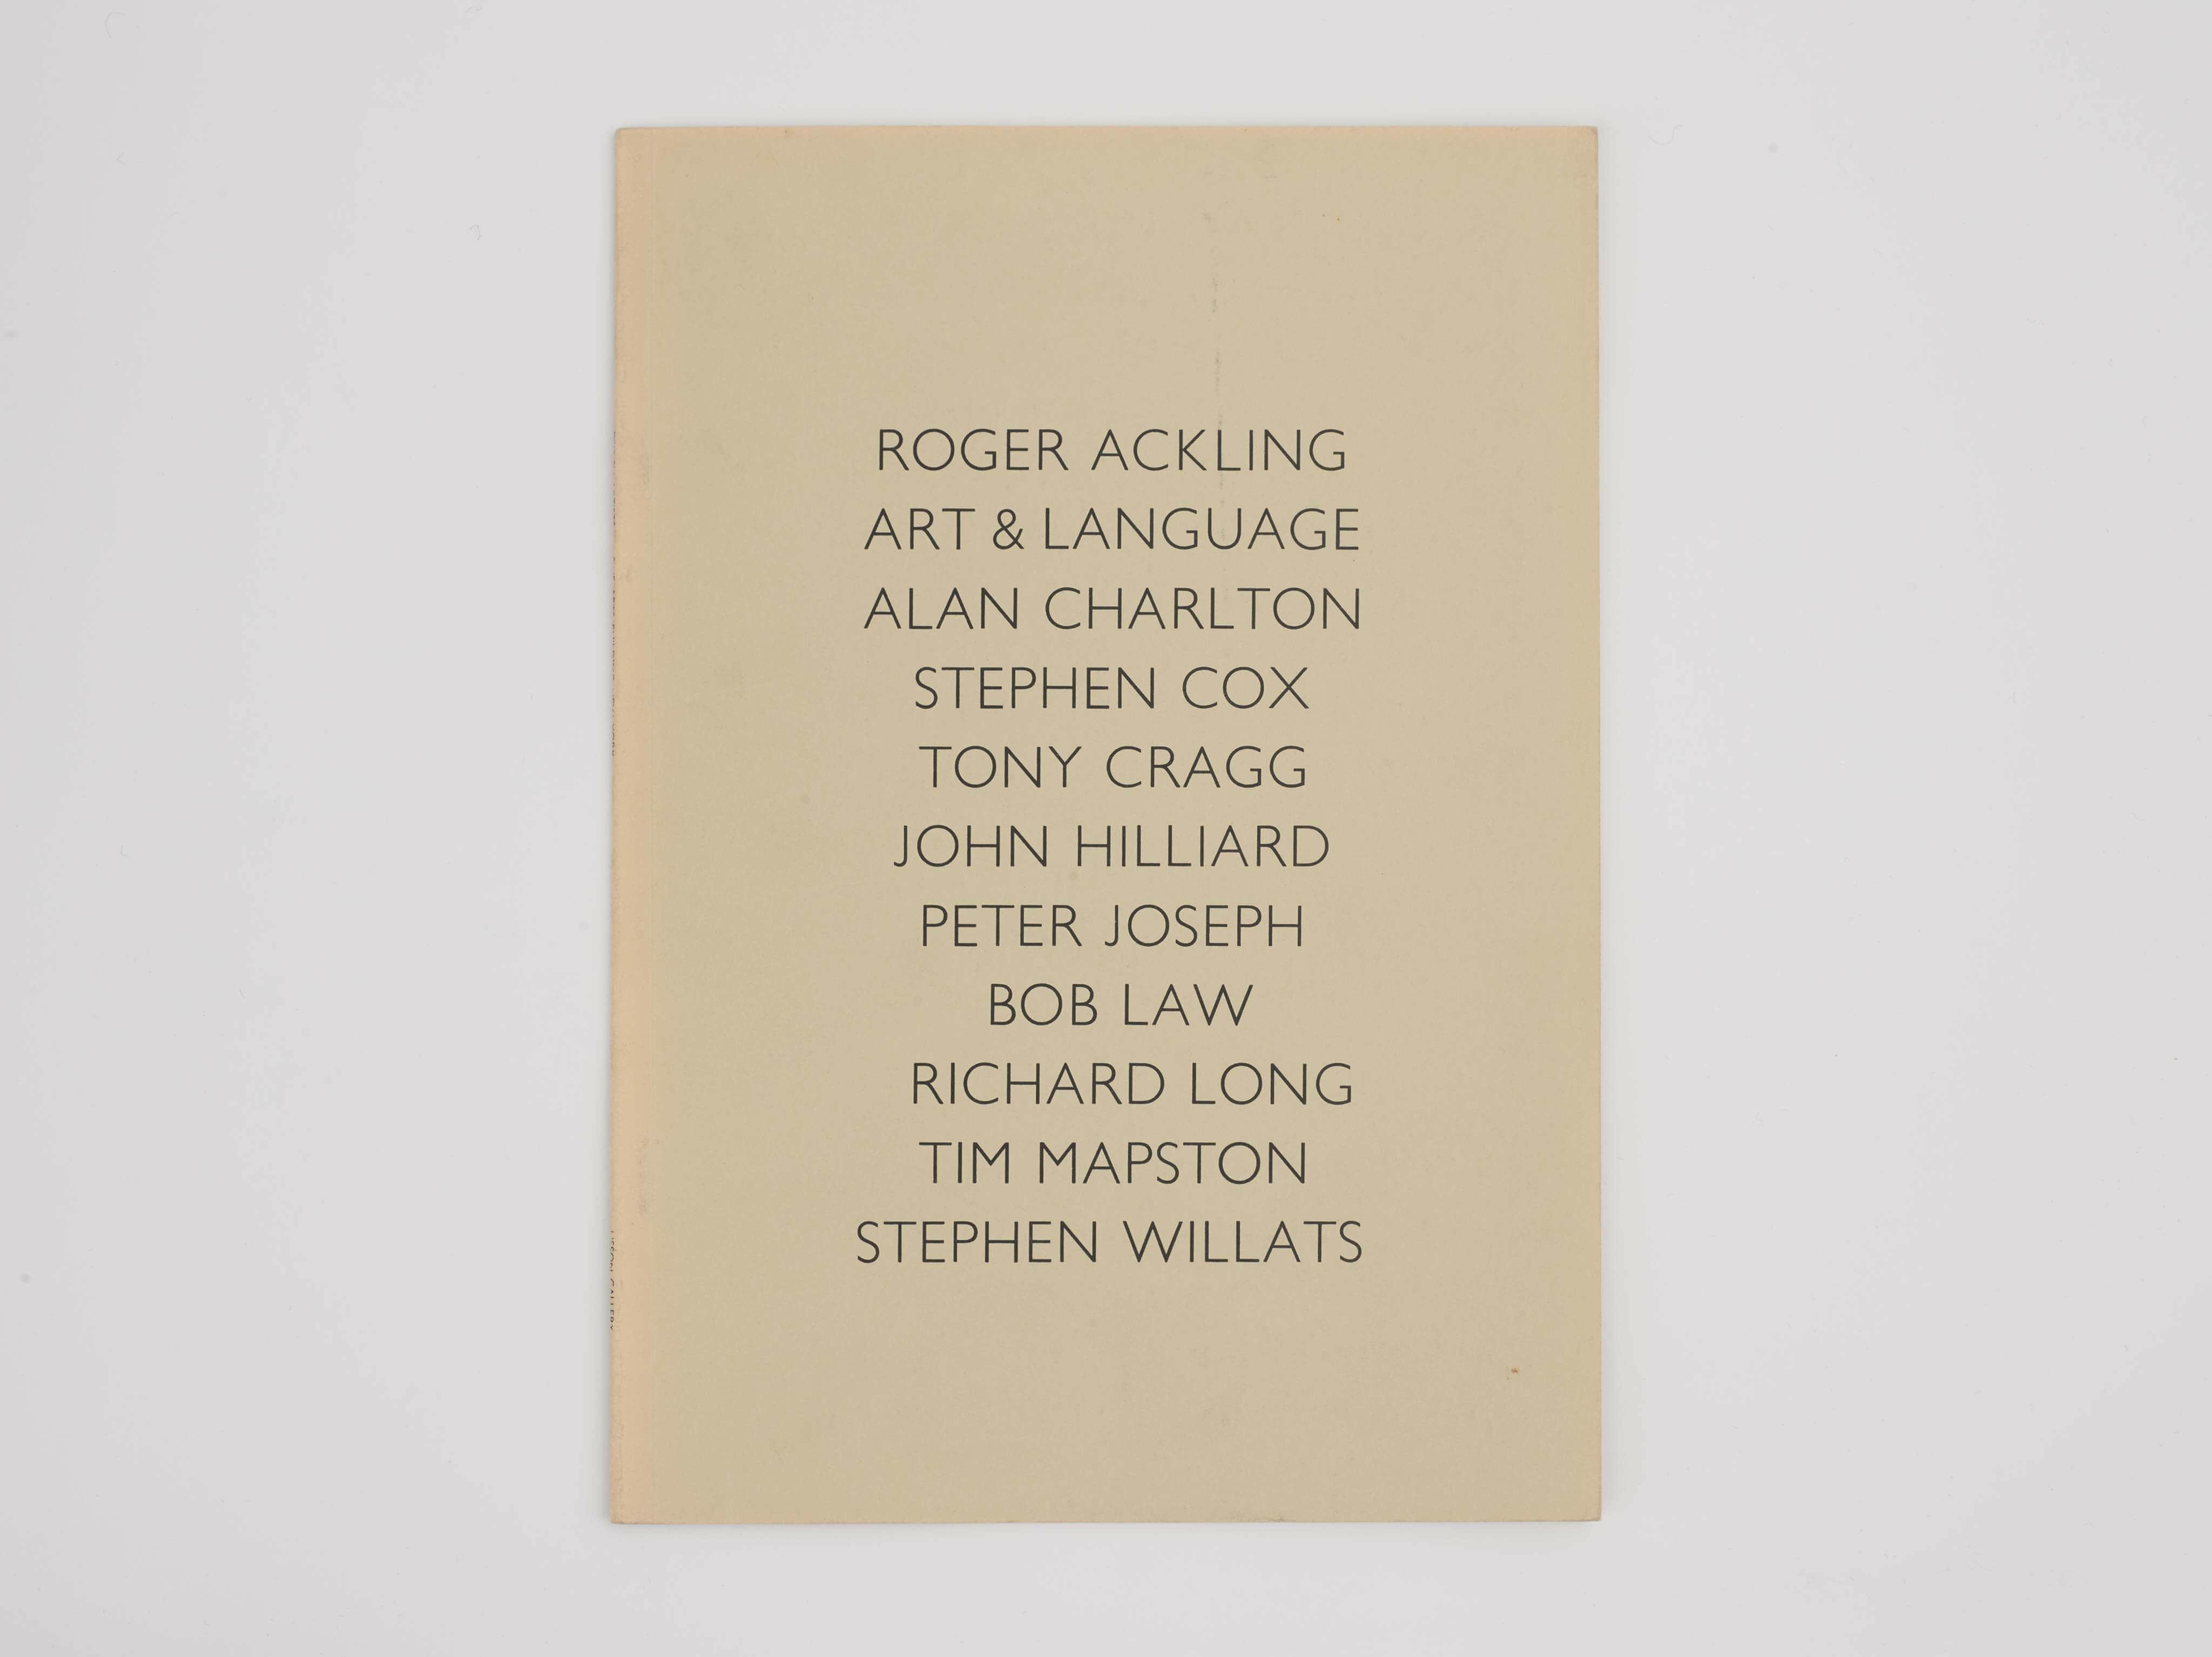 LONDON/NEW YORK: Fine Arts Building, 1977 cover